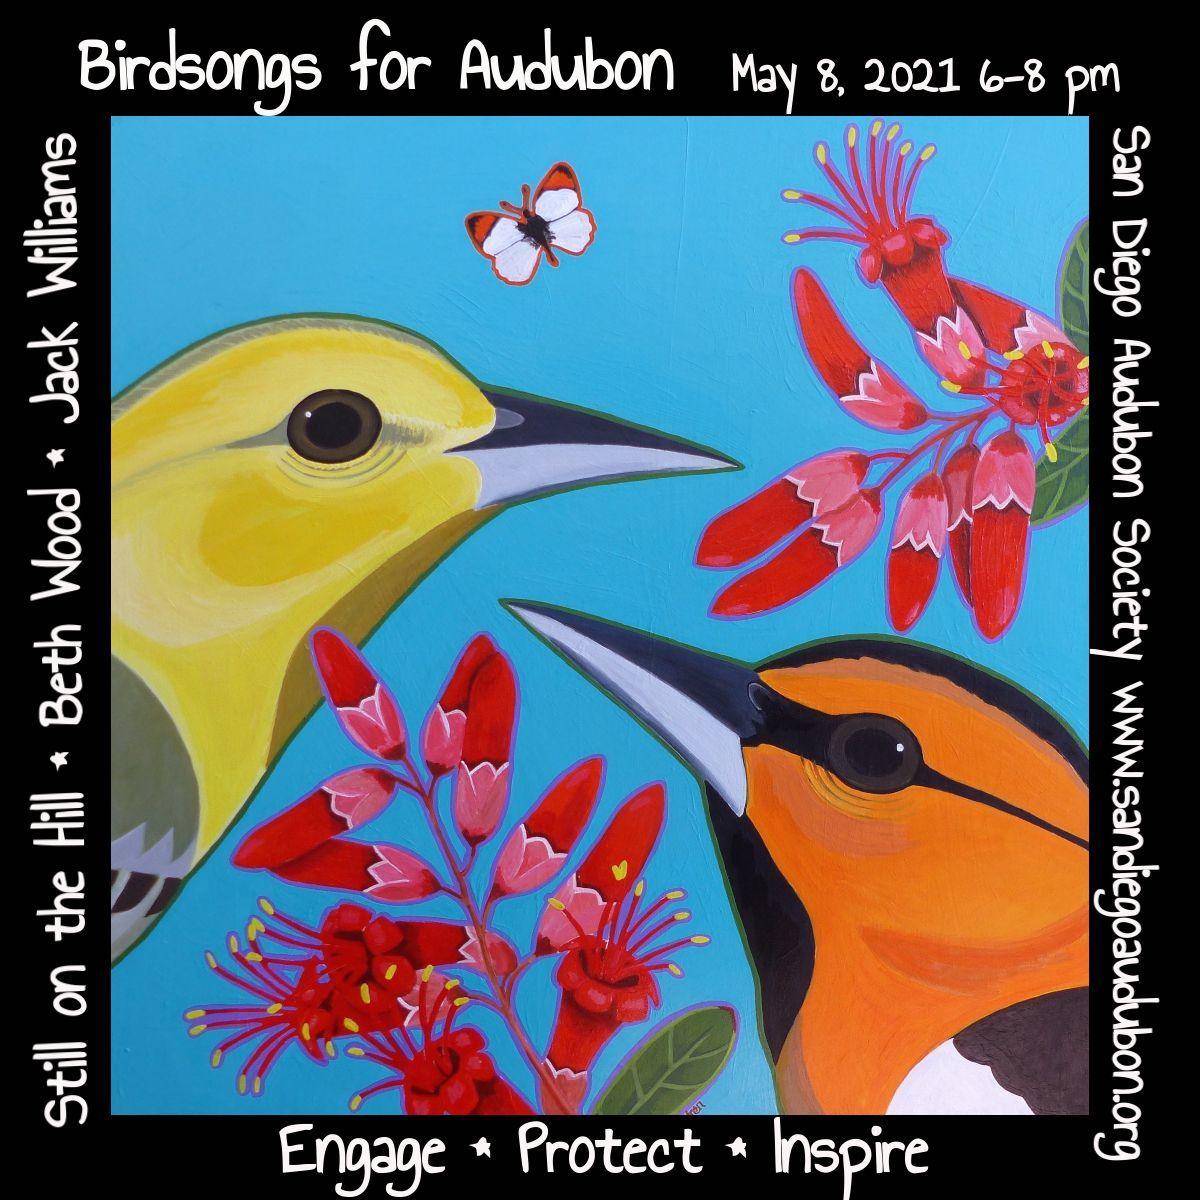 Birdsongs for Audubon